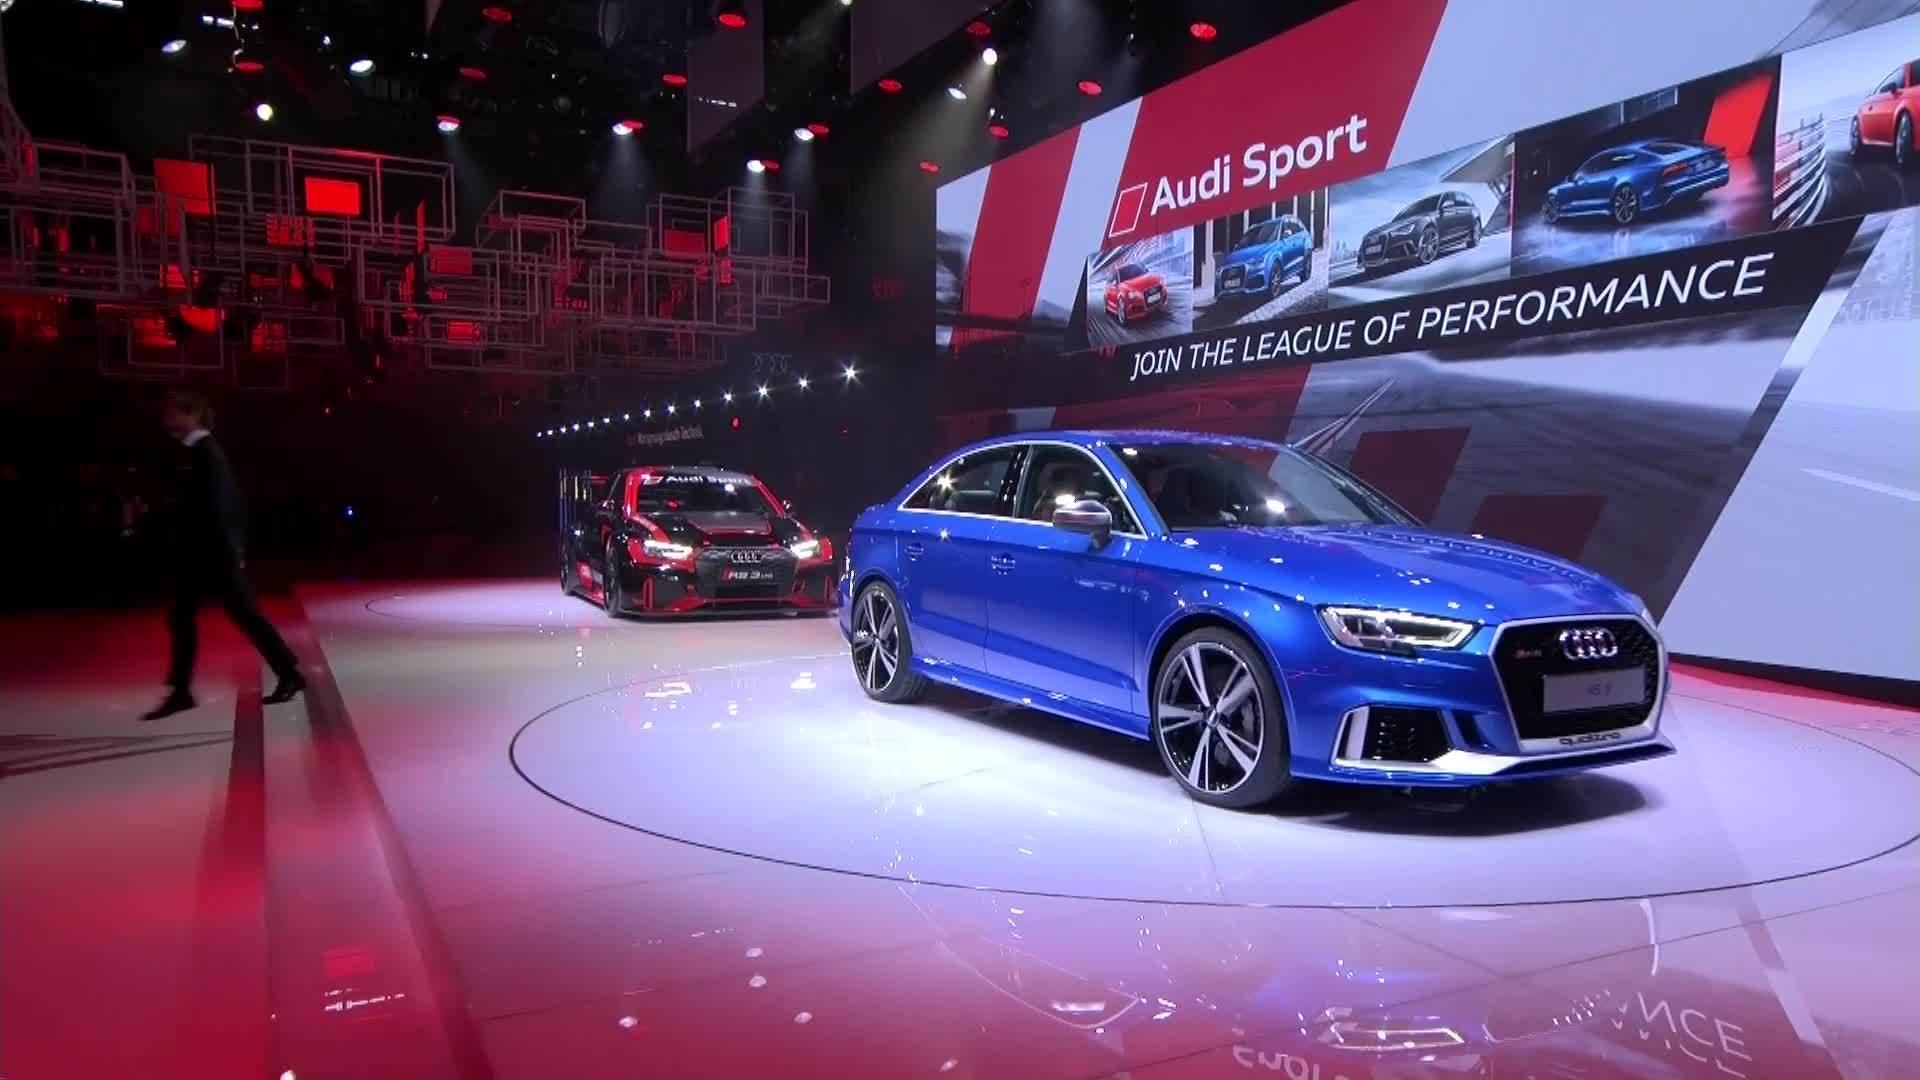 Best of Audi Sport at the Paris Motor Show